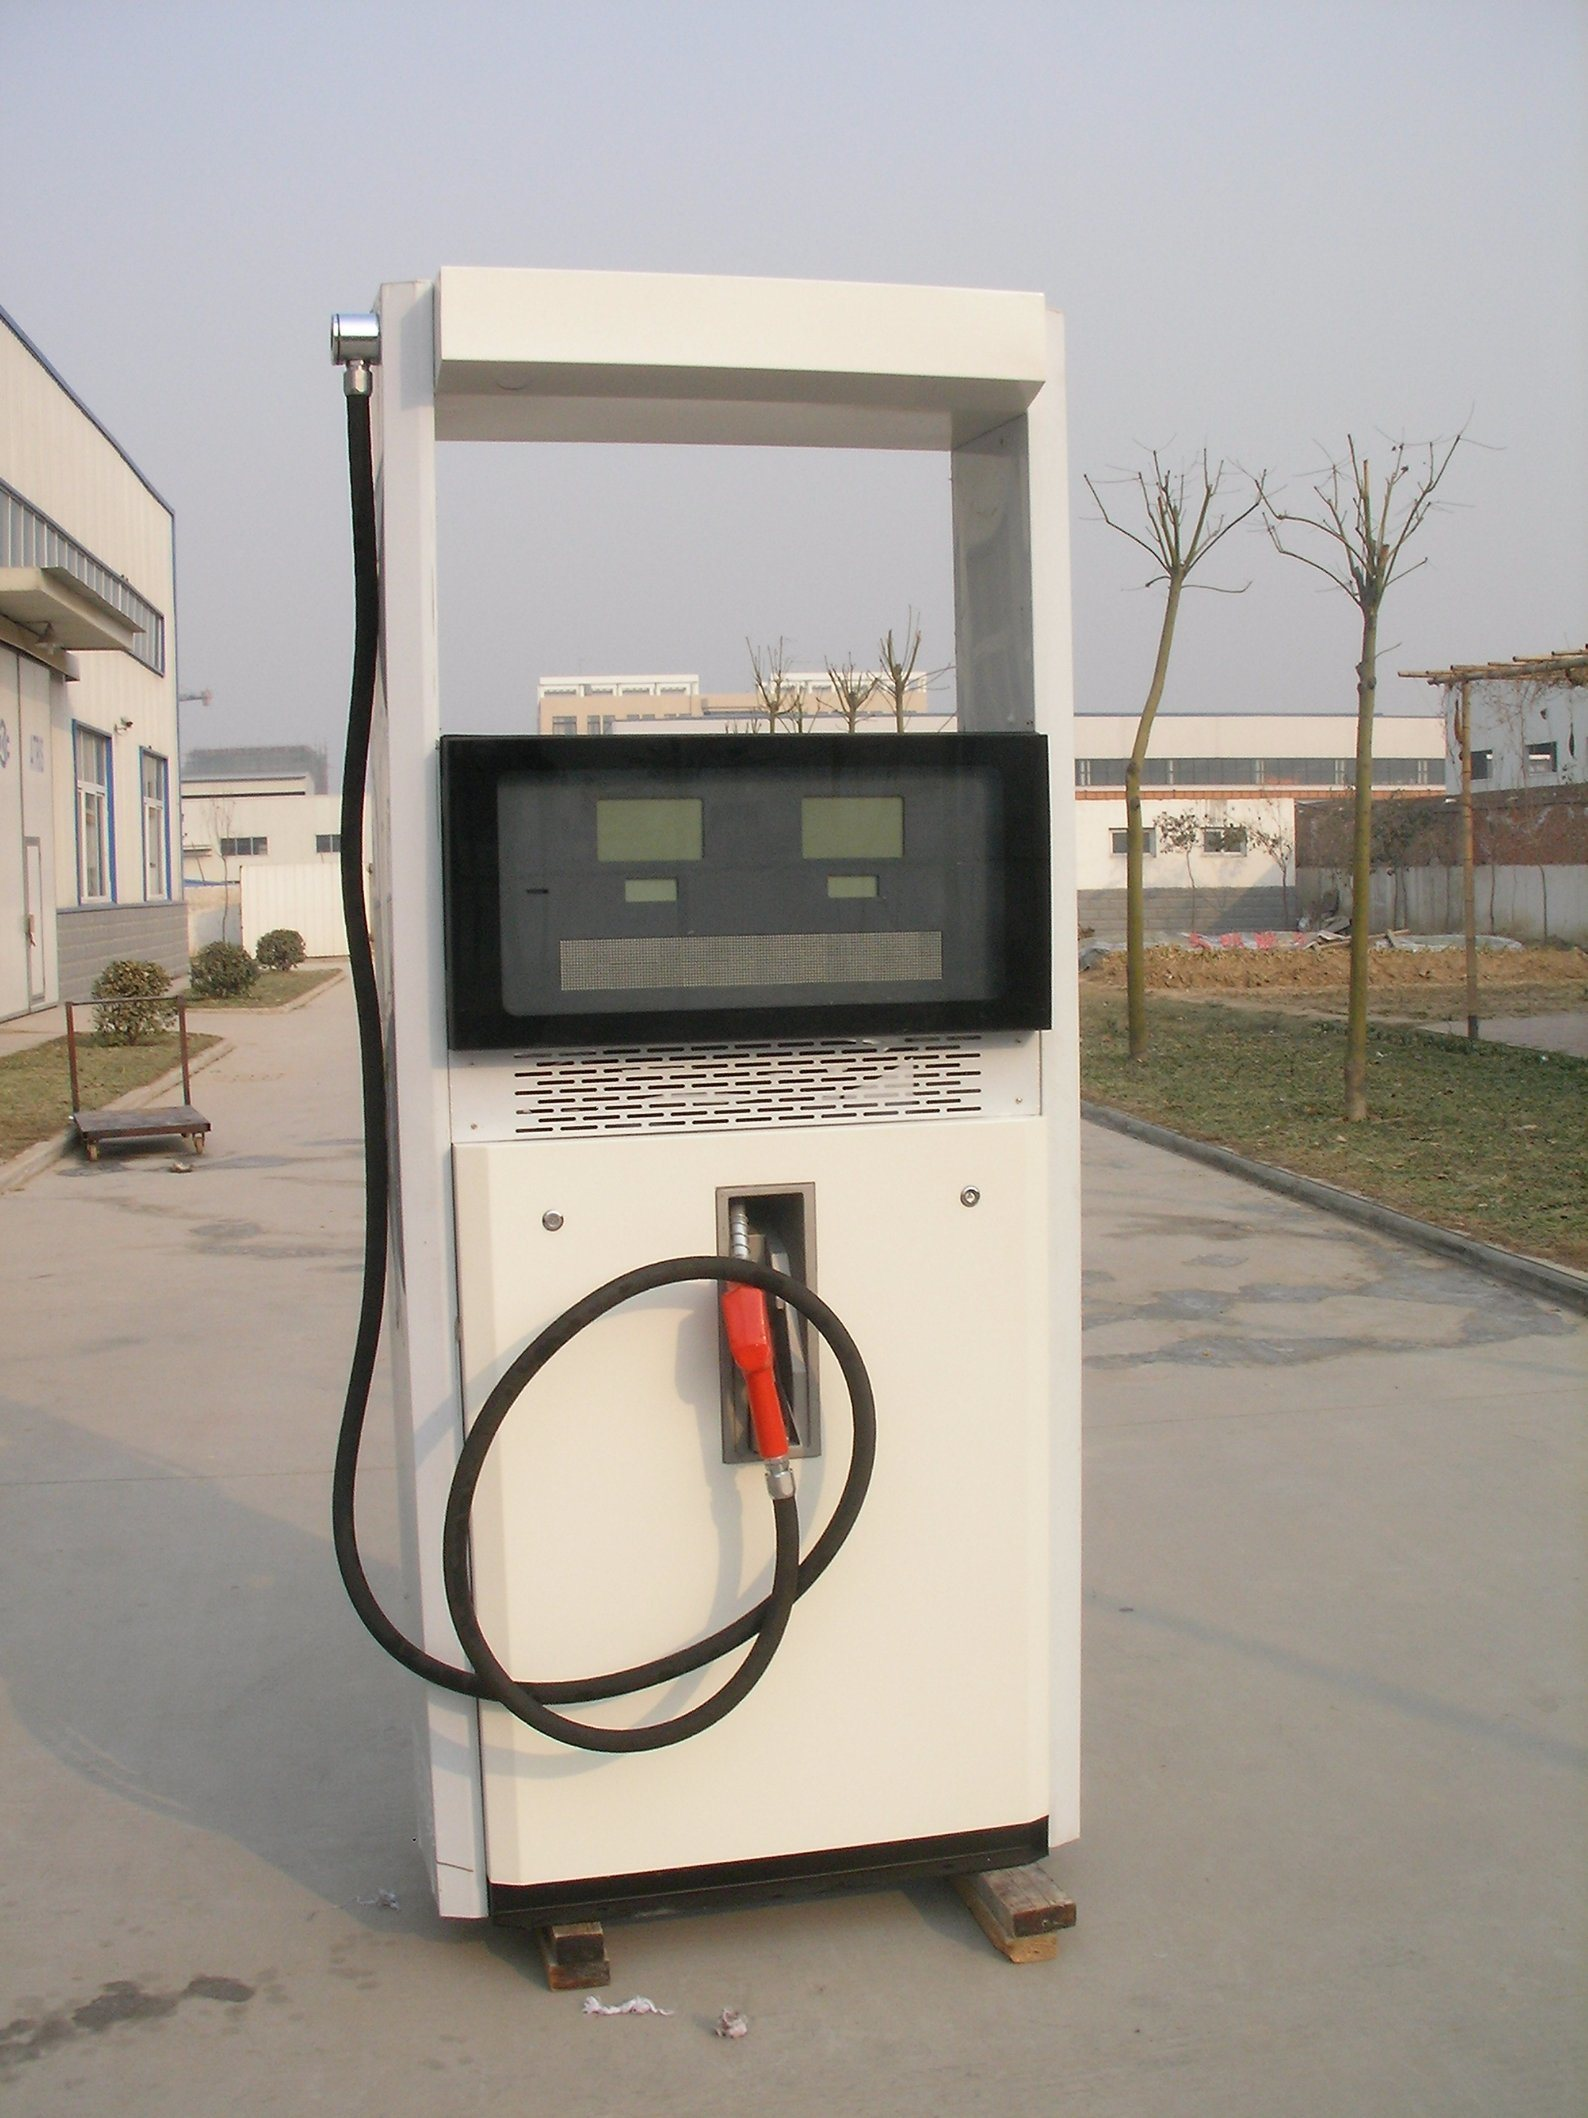 Two Nozzle Two Pump Oil Station Fuel Dispenser